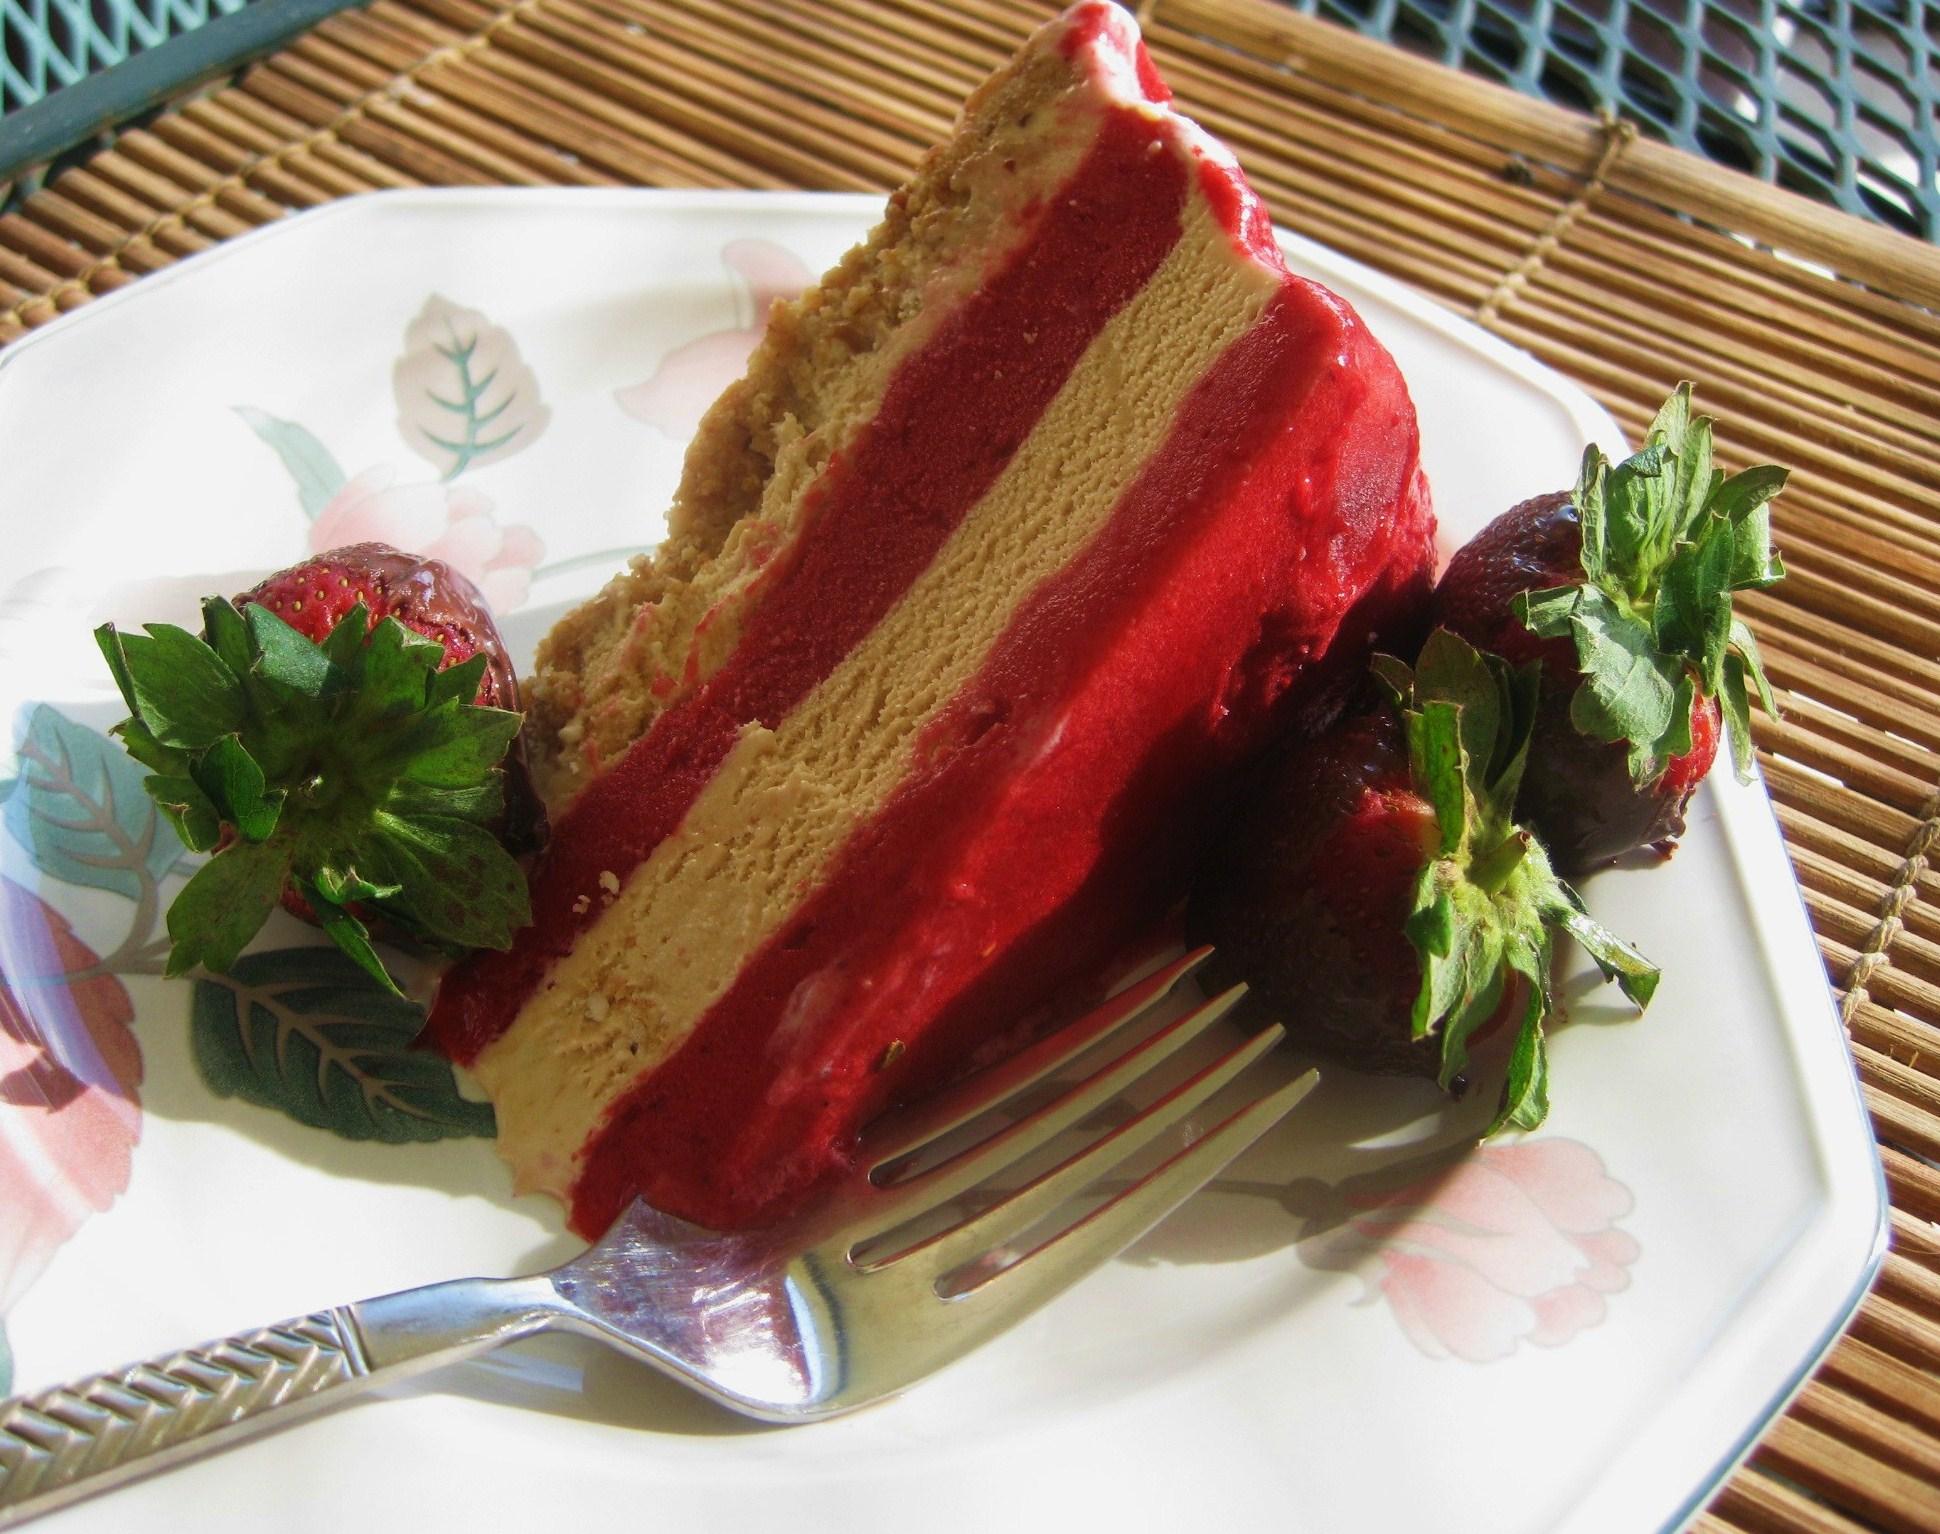 Dulce de Leche Ice Cream Cake – Savoring Every Bite